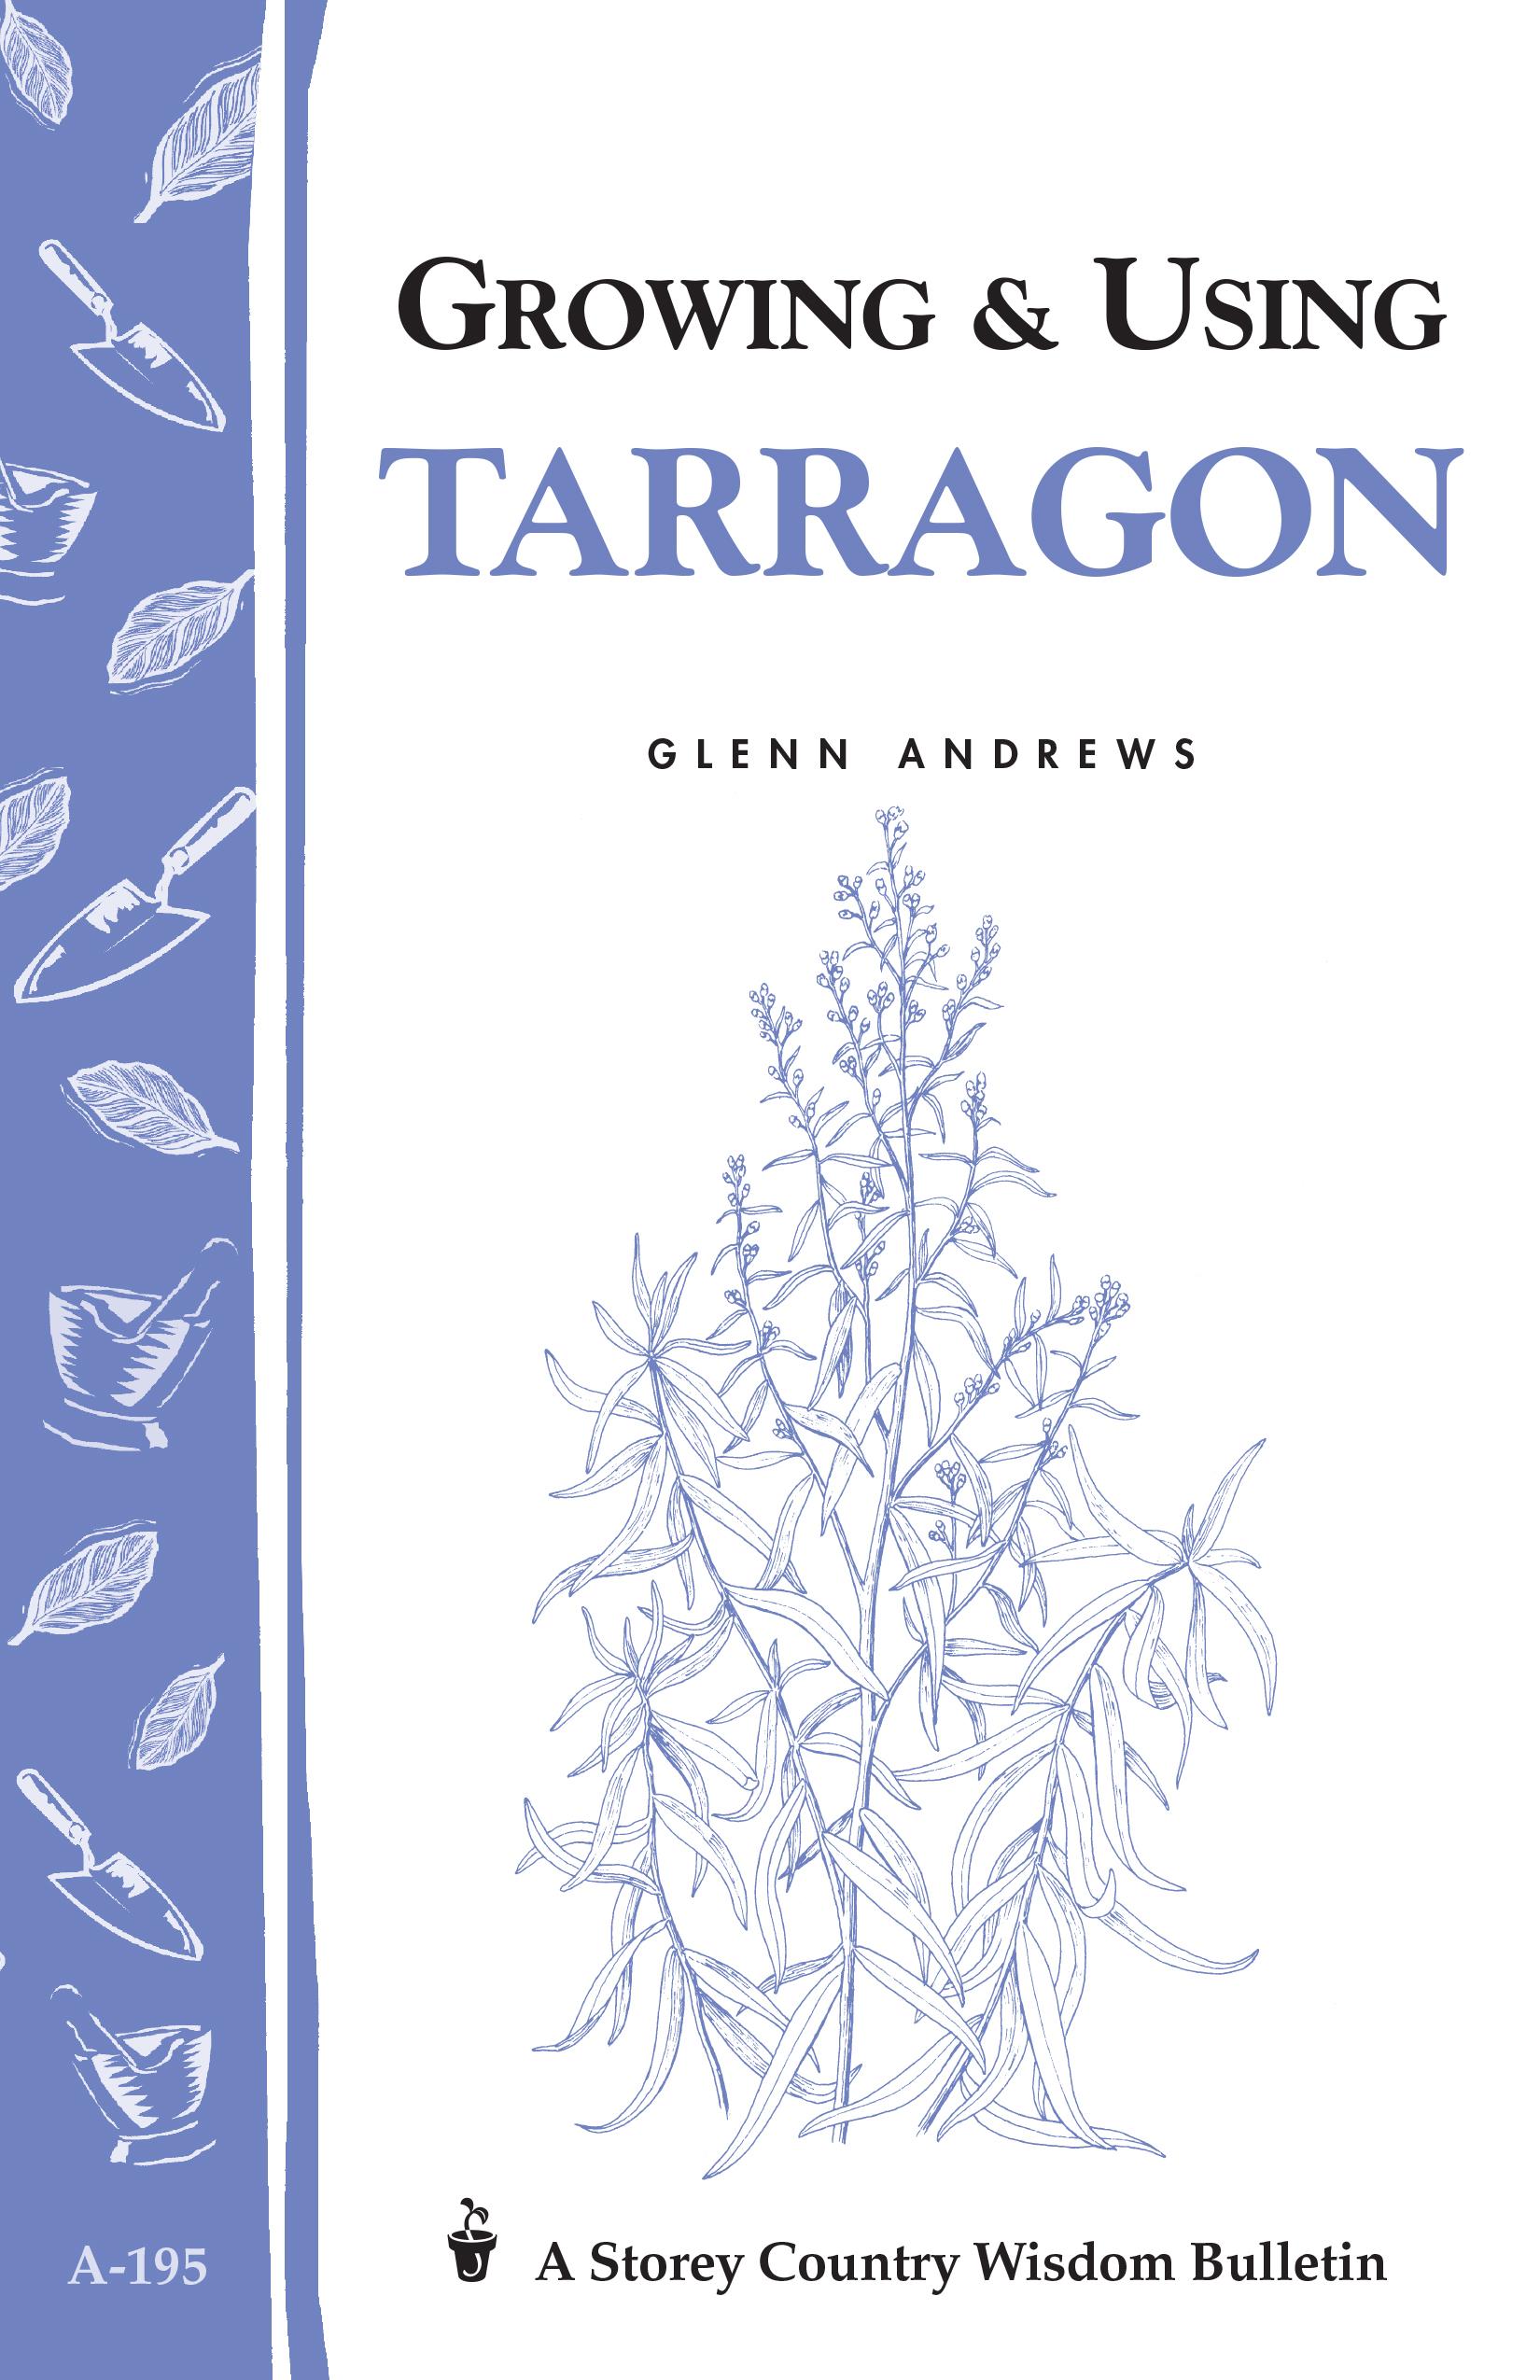 Growing & Using Tarragon Storey's Country Wisdom Bulletin A-195 - Glenn Andrews